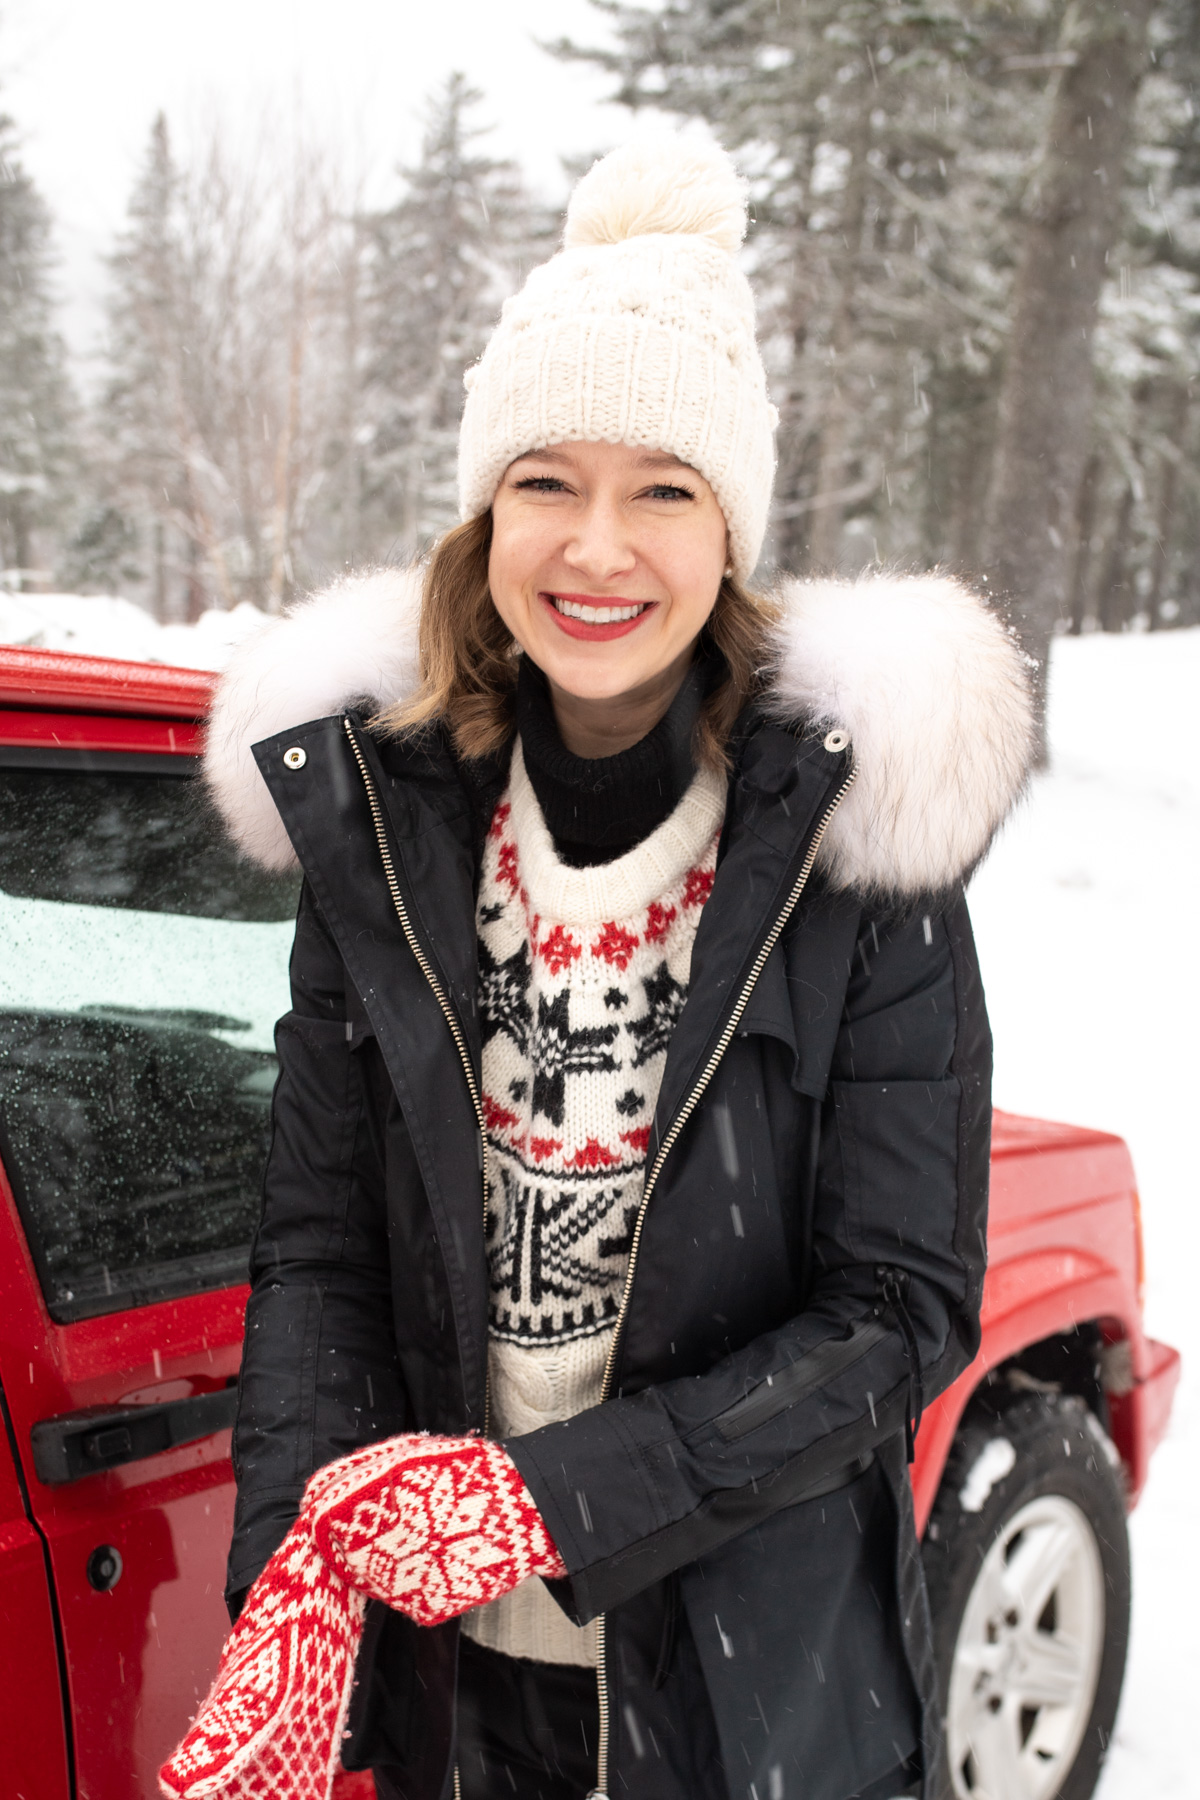 Stacie Flinner x Winter Essentials Troy London Jacket-16.jpg